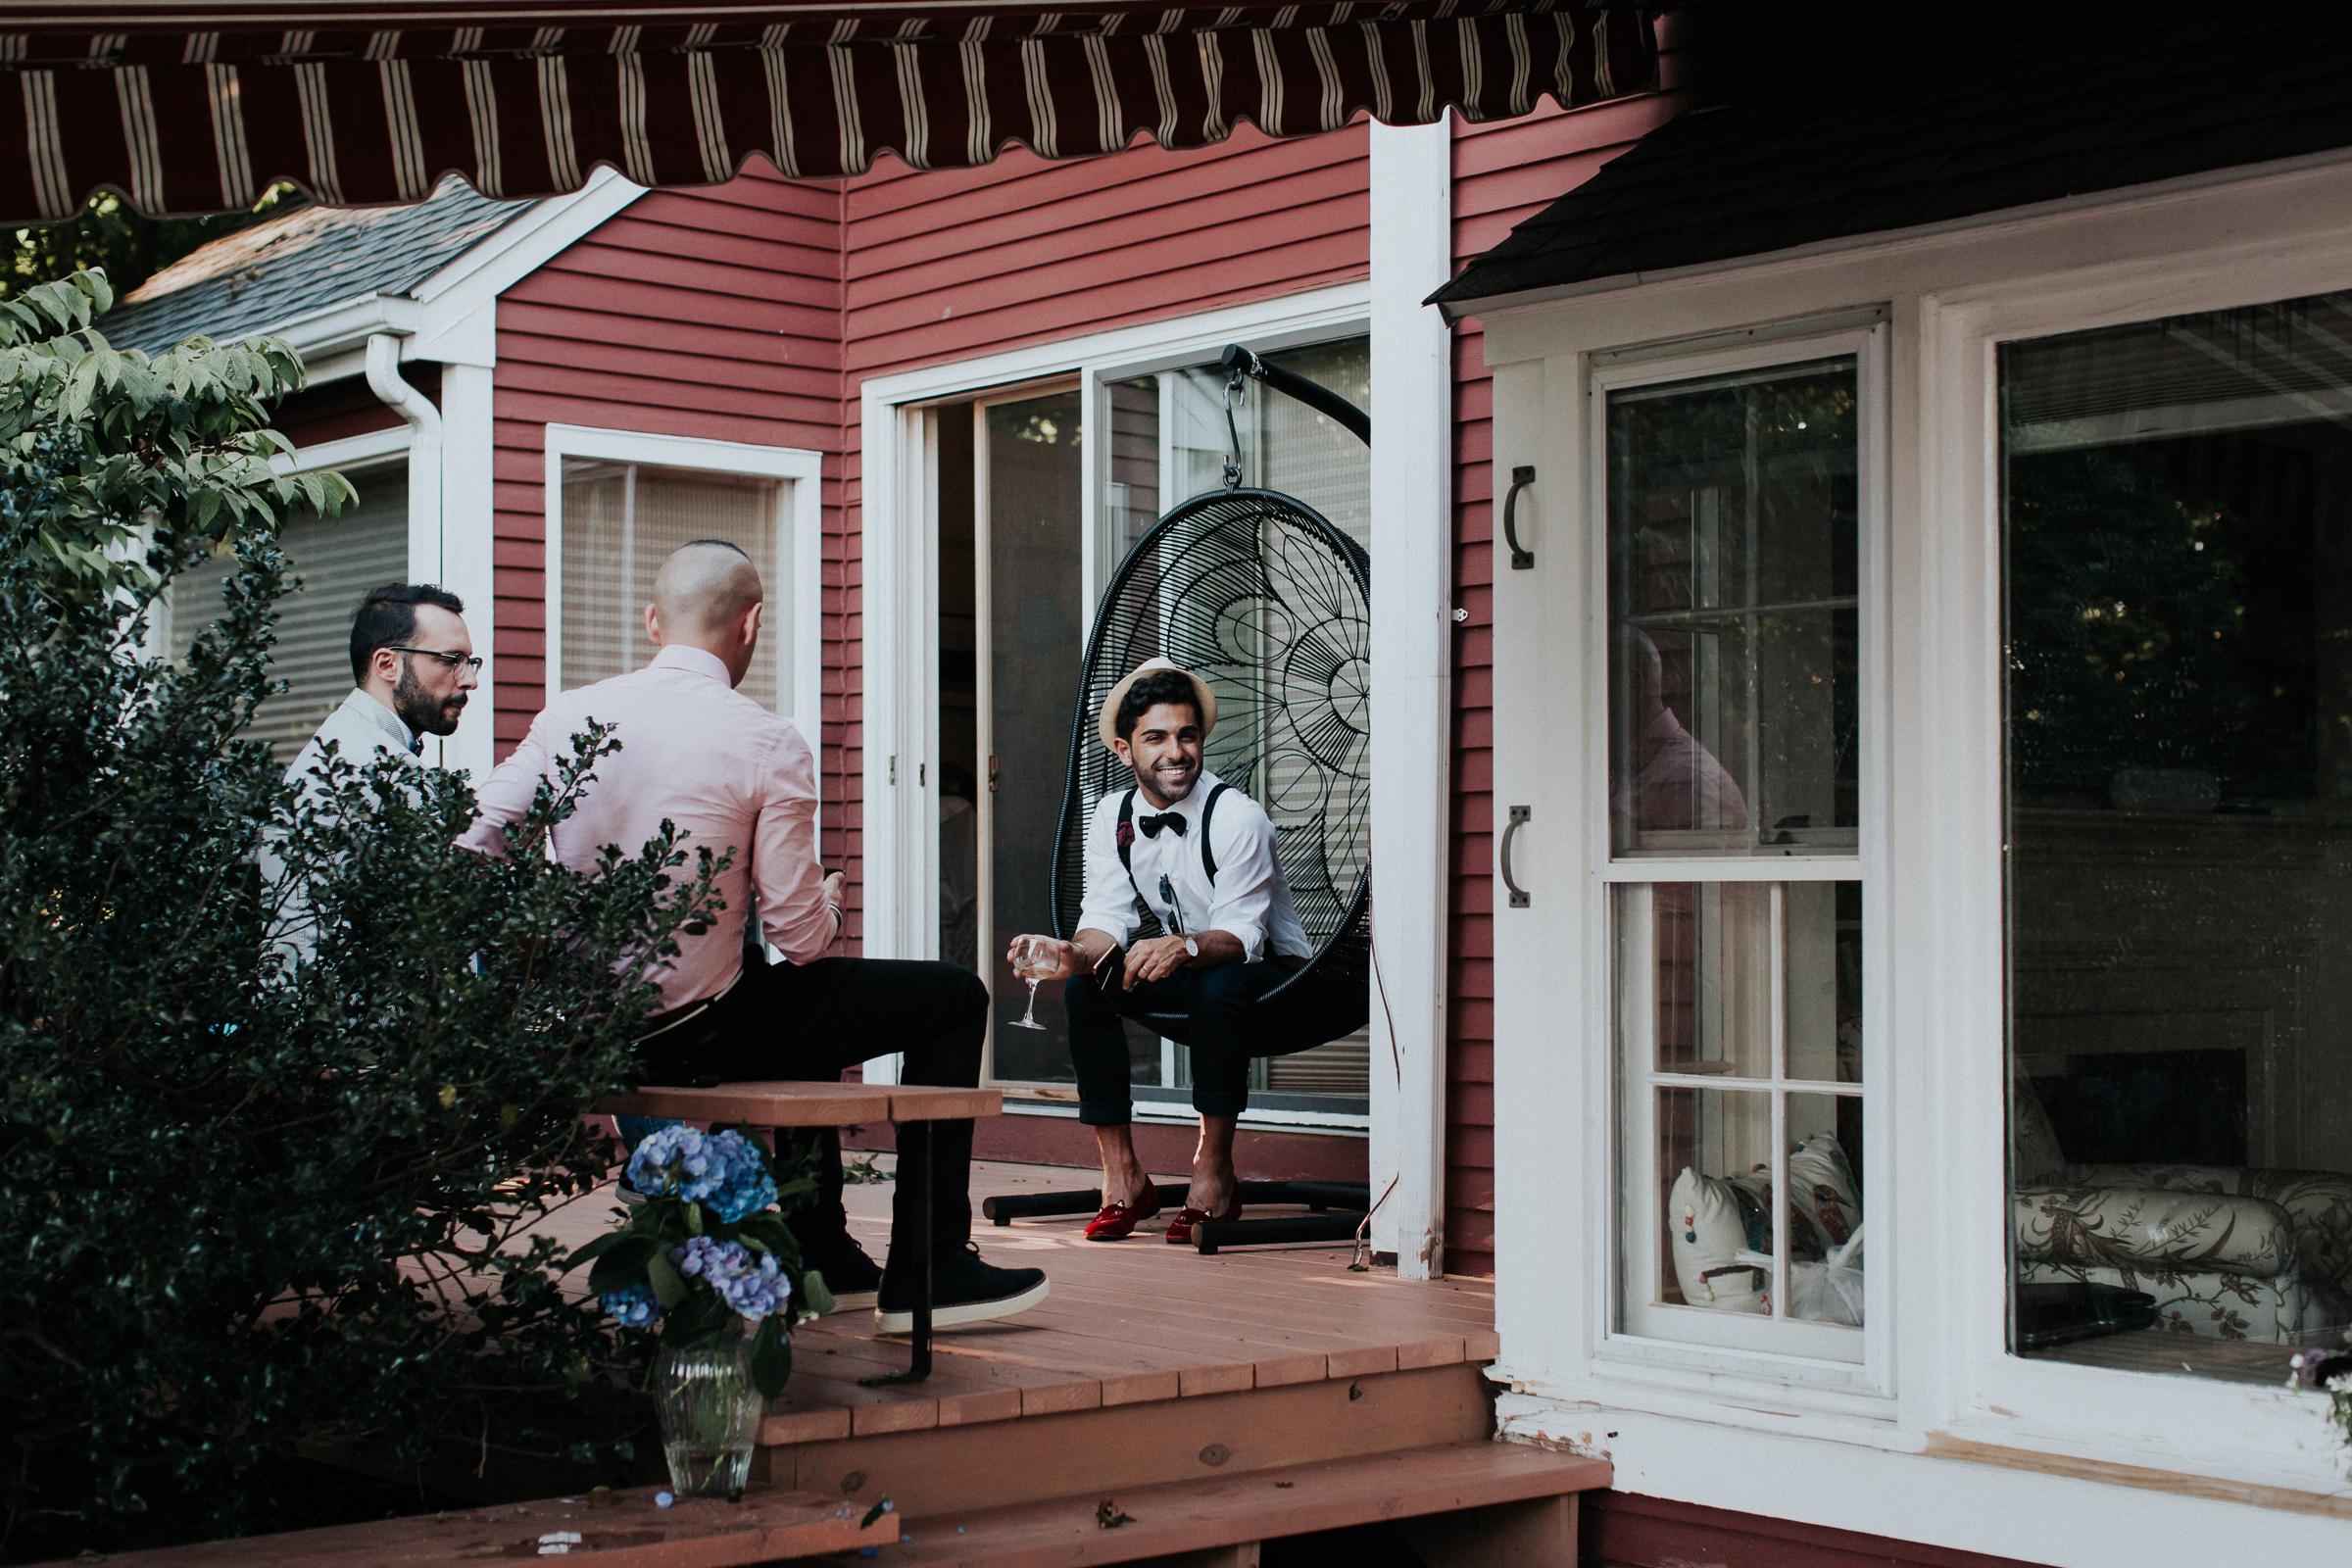 Backyard-Intimate-Adventurous-Destination-Wedding-Darien-Connecticut-Documentary-Wedding-Photography-164.jpg